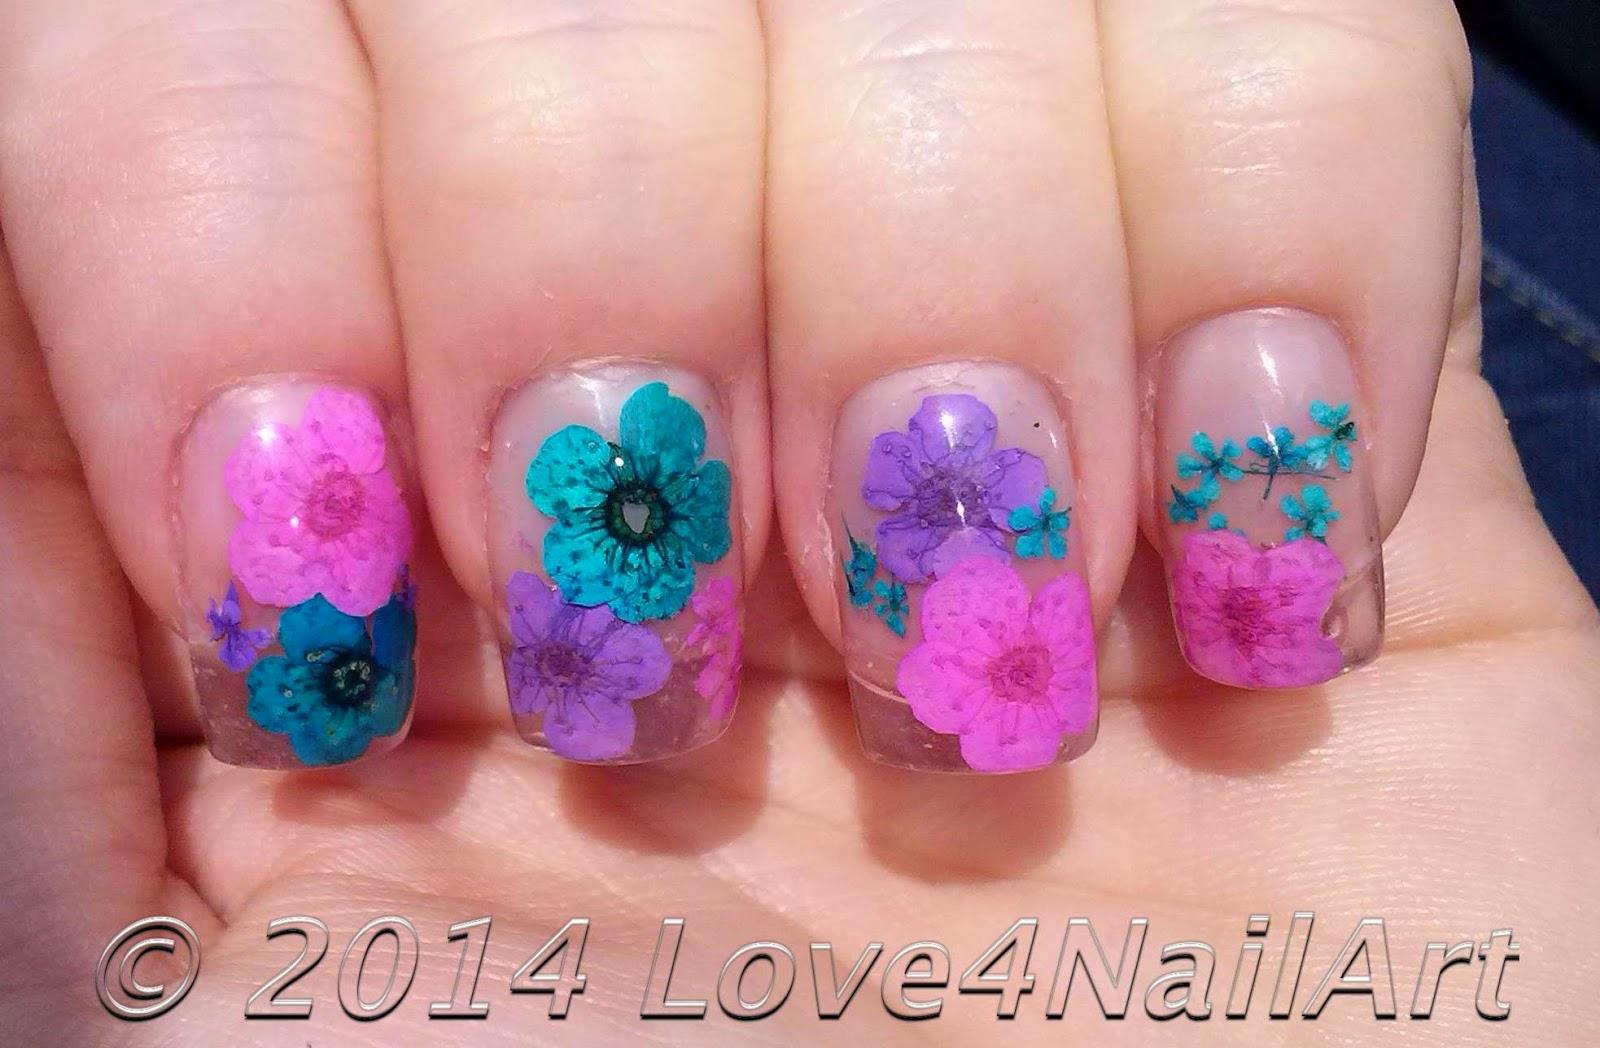 Love4NailArt: Encapulated Dried Flower Acrylic Nails